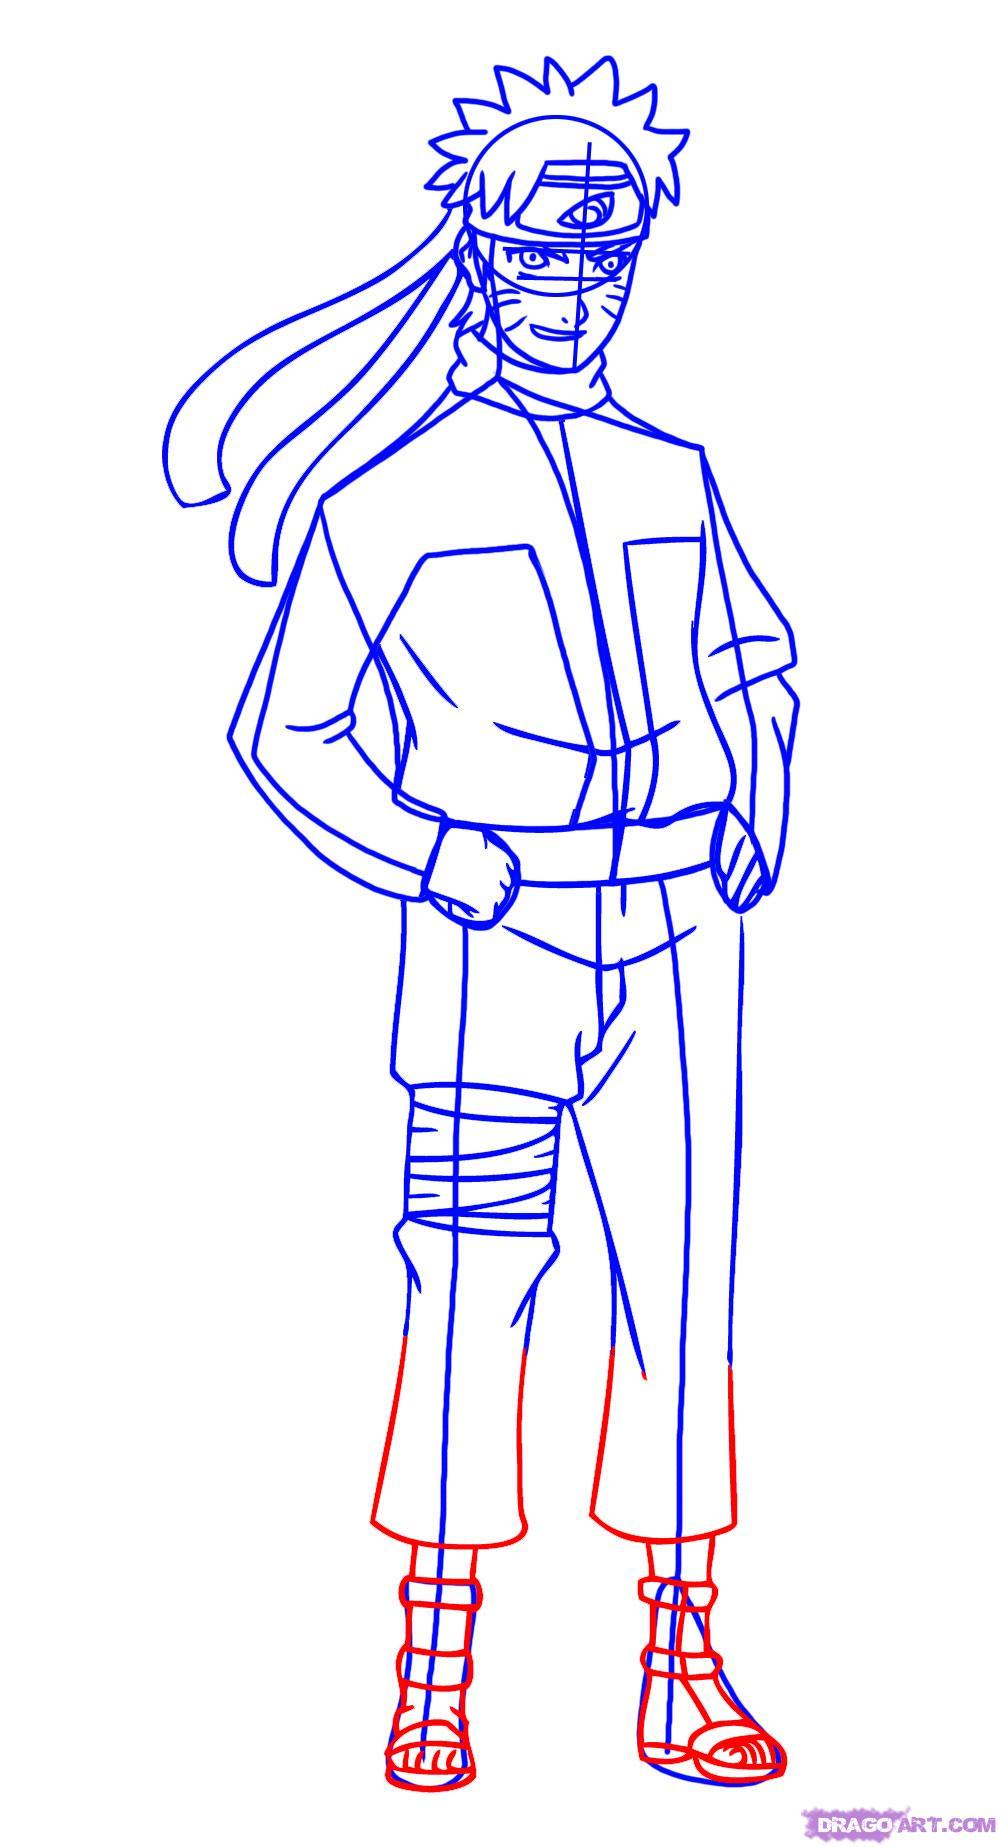 Drawn naruto dragoart Shippuden How Naruto 7 how